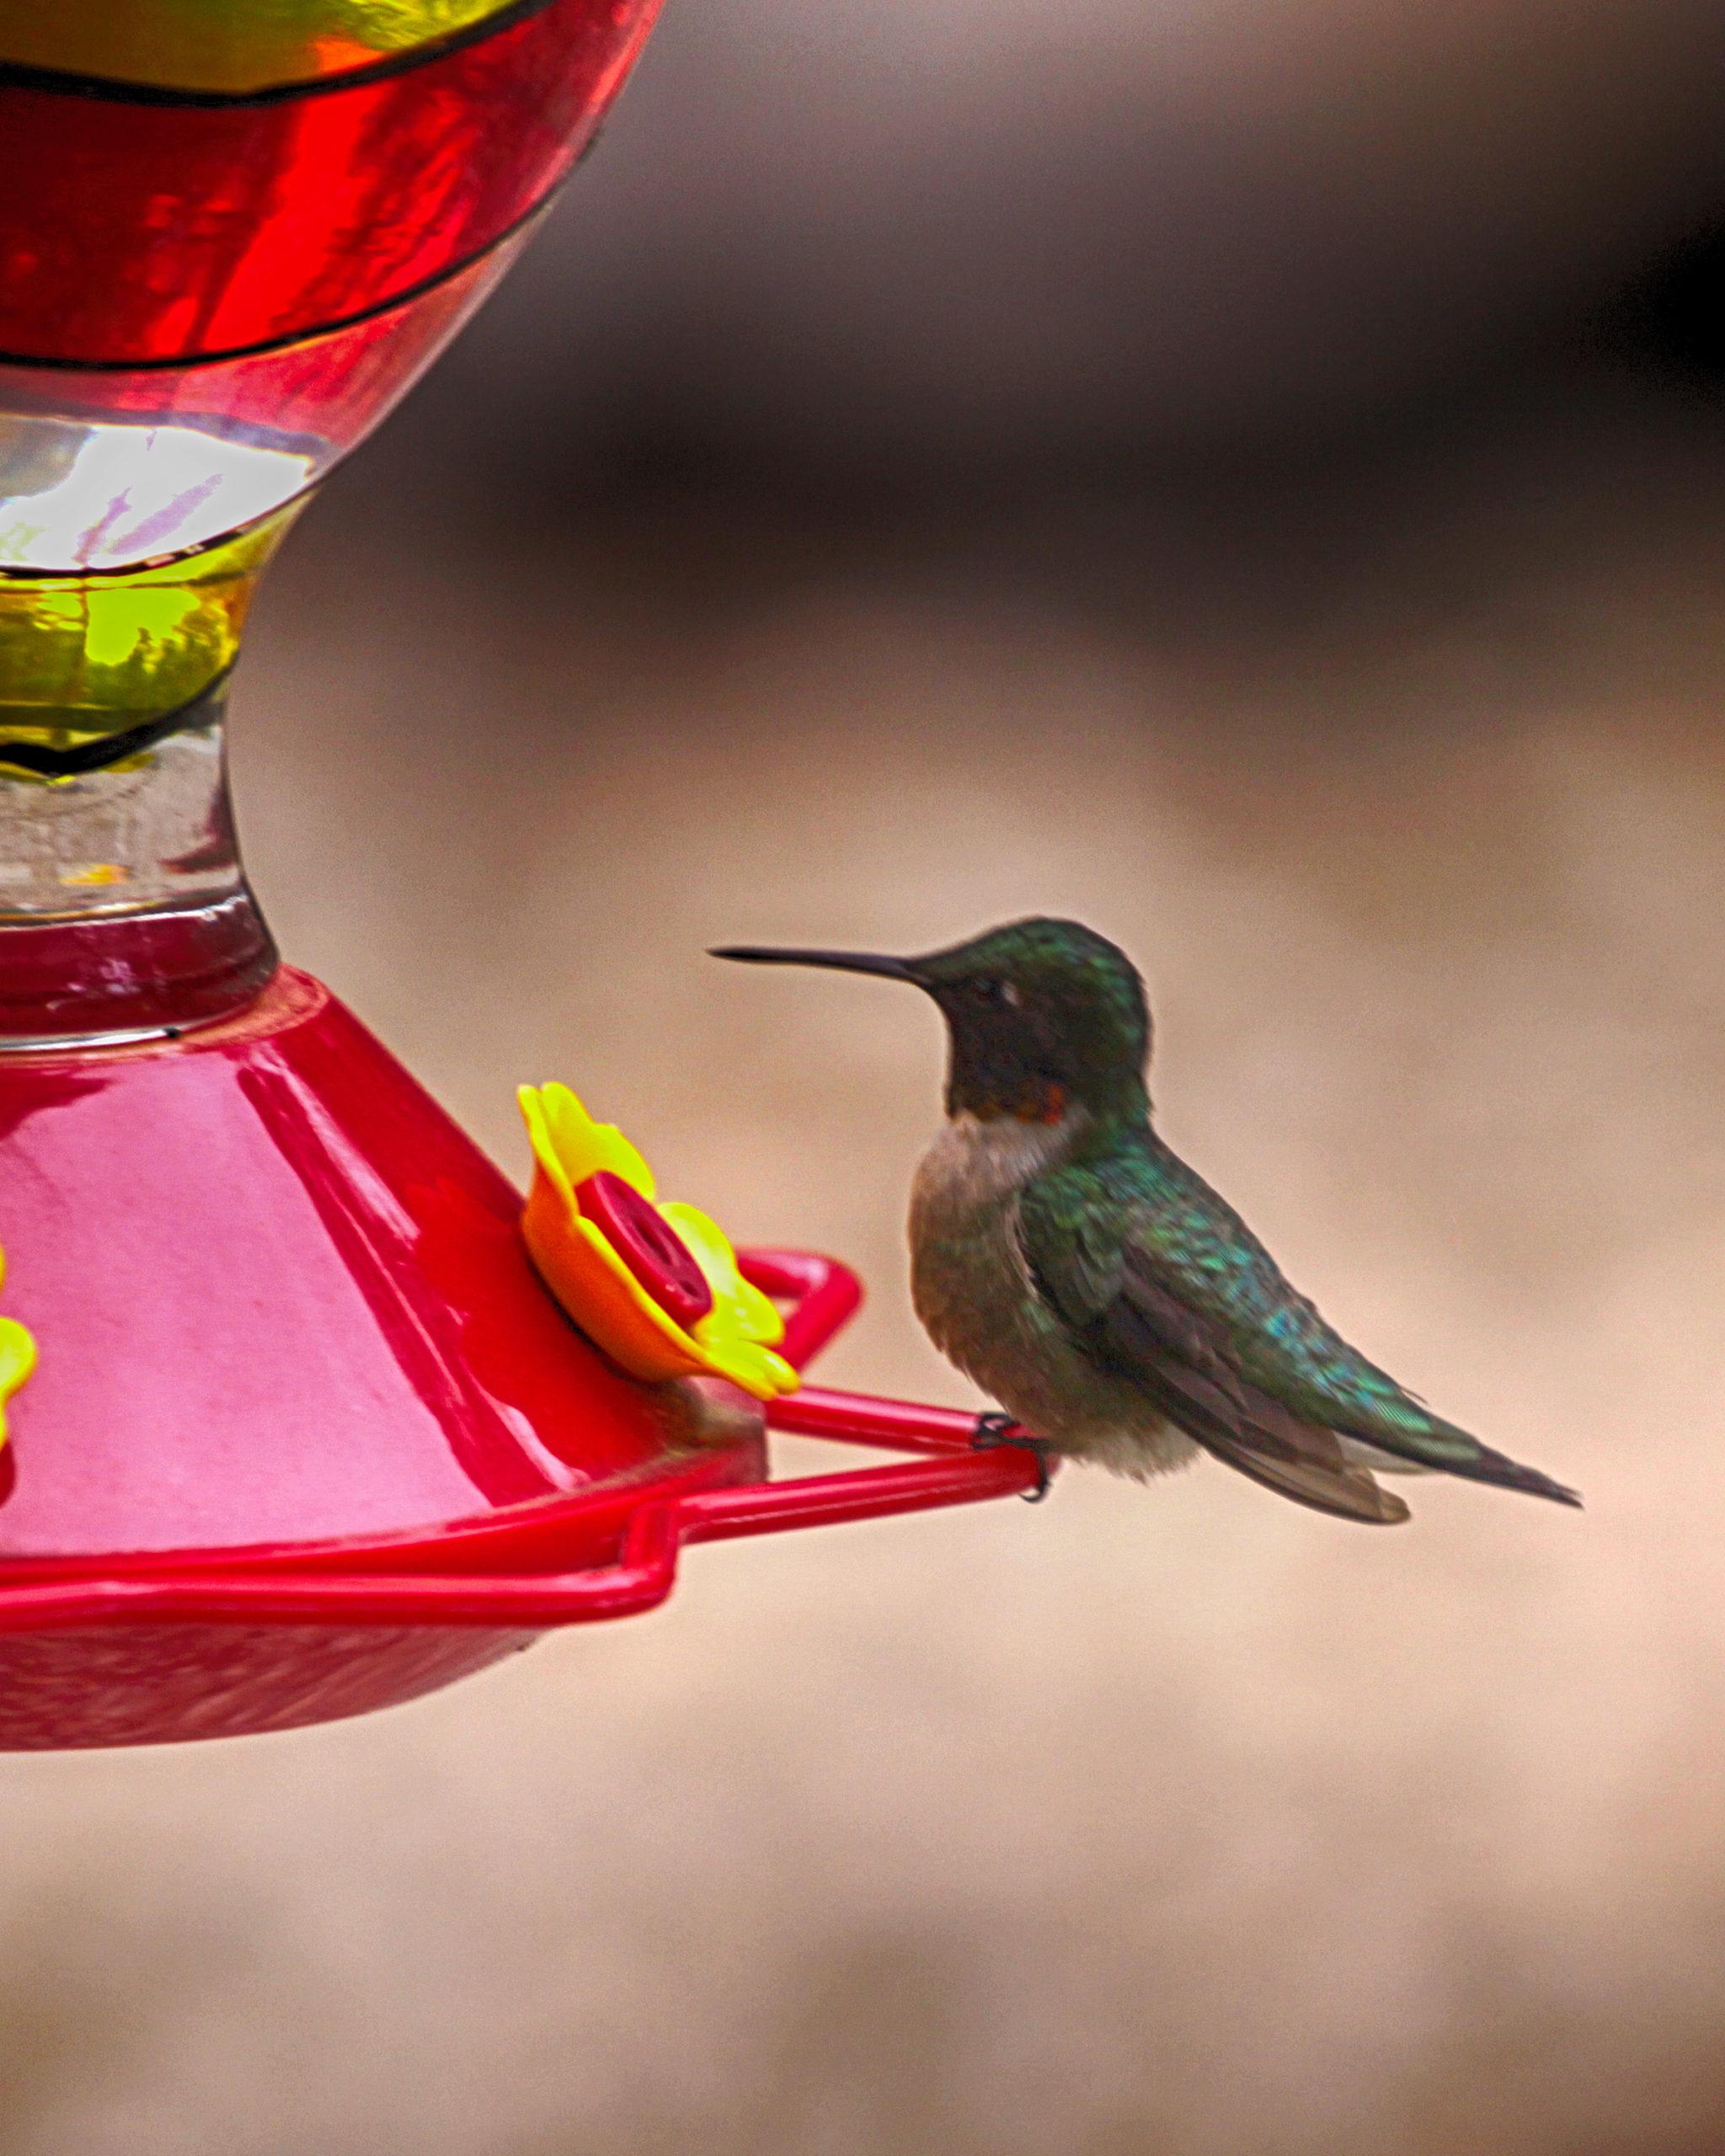 Image of ruby throated hummingbird